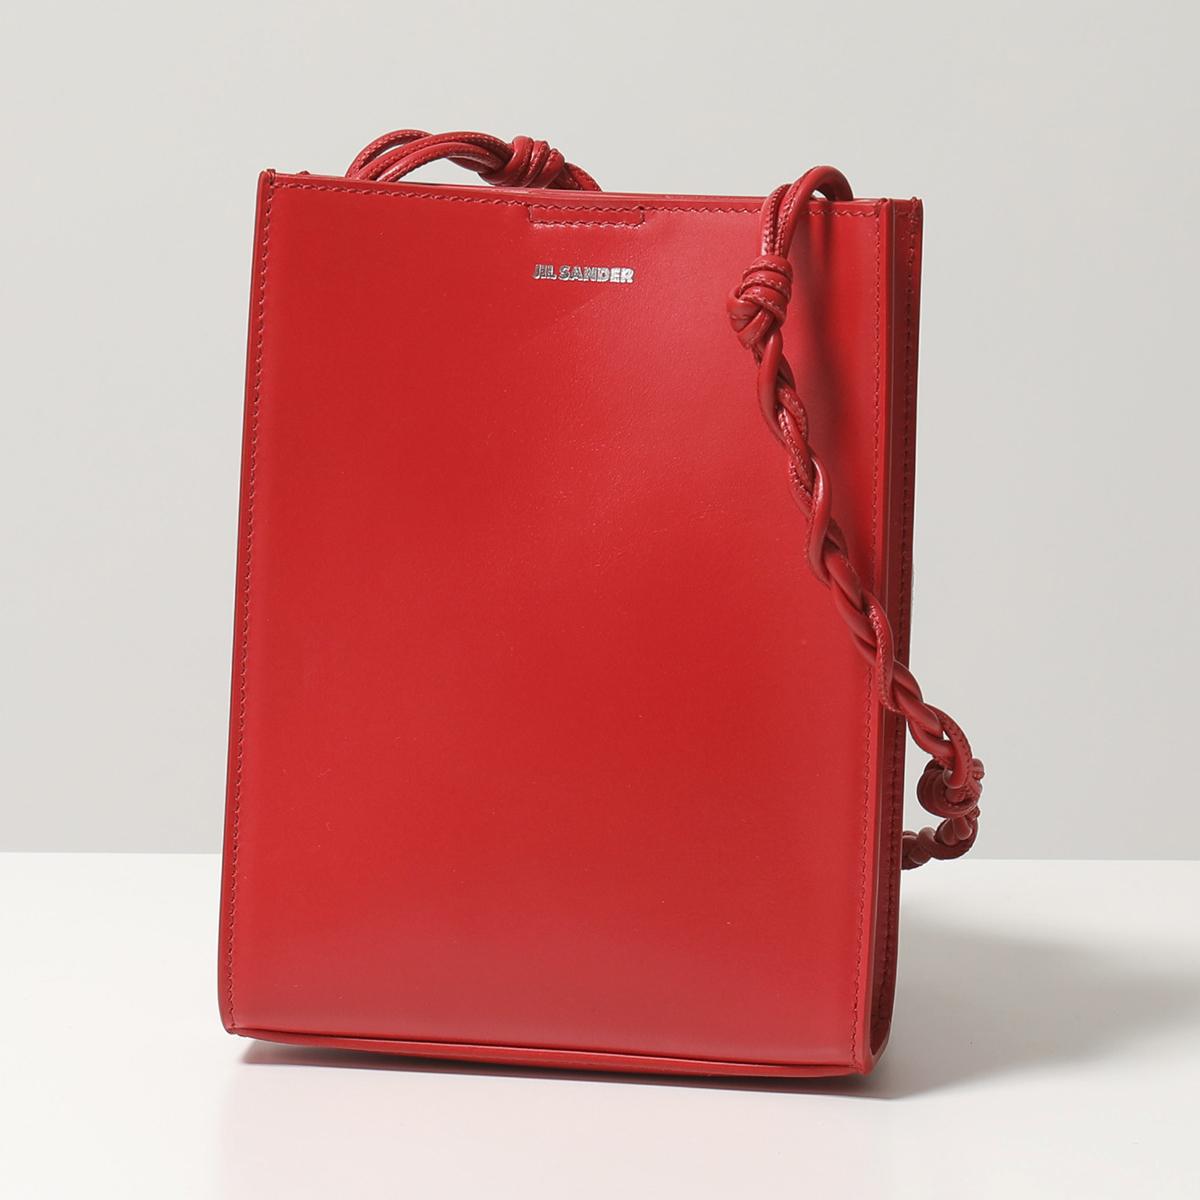 JILSANDER ジルサンダー JSPQ850173 WQB69110N 620 TANGLE SM レザー ショルダーバッグ ハンドバッグ 鞄 レディース